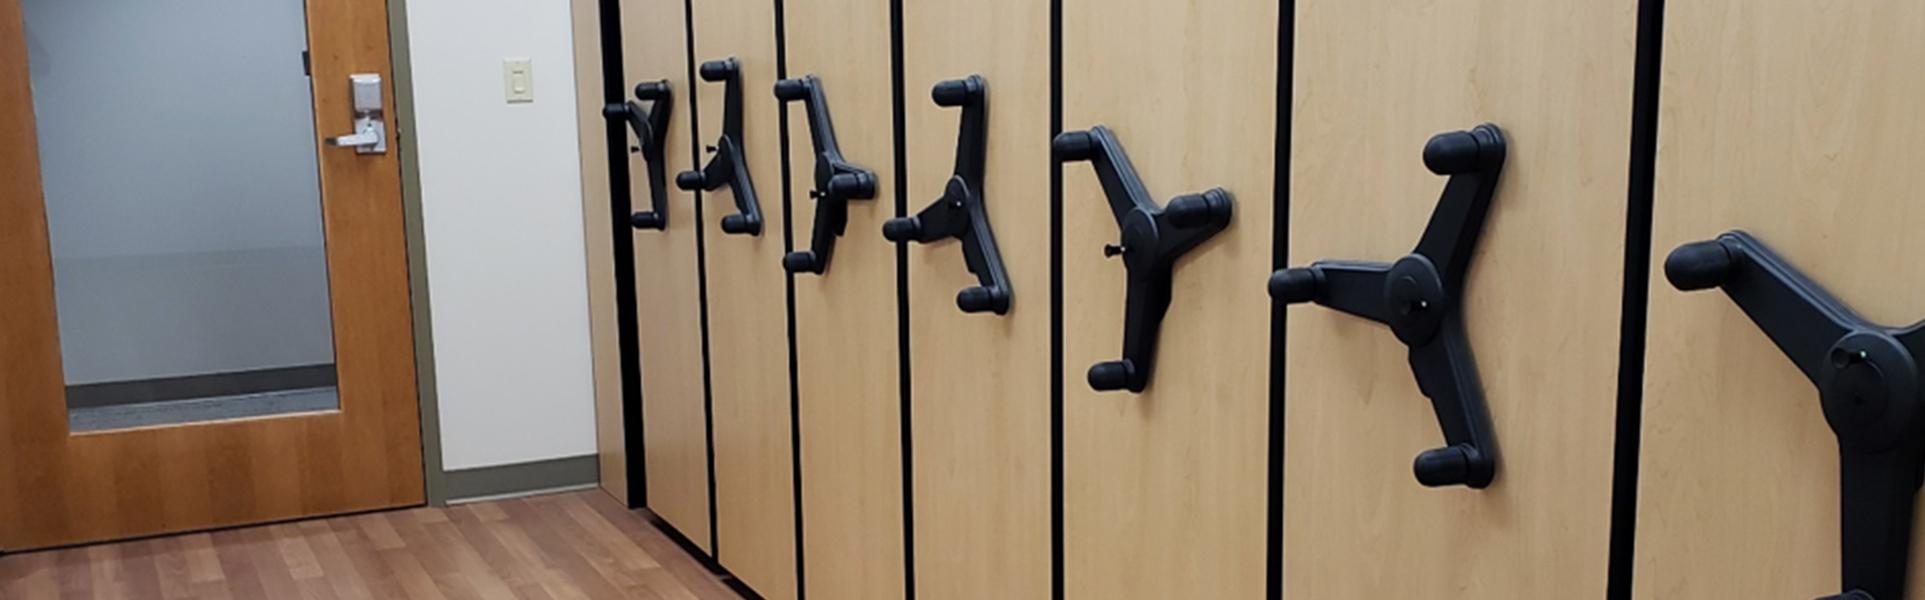 medical supply room storage system